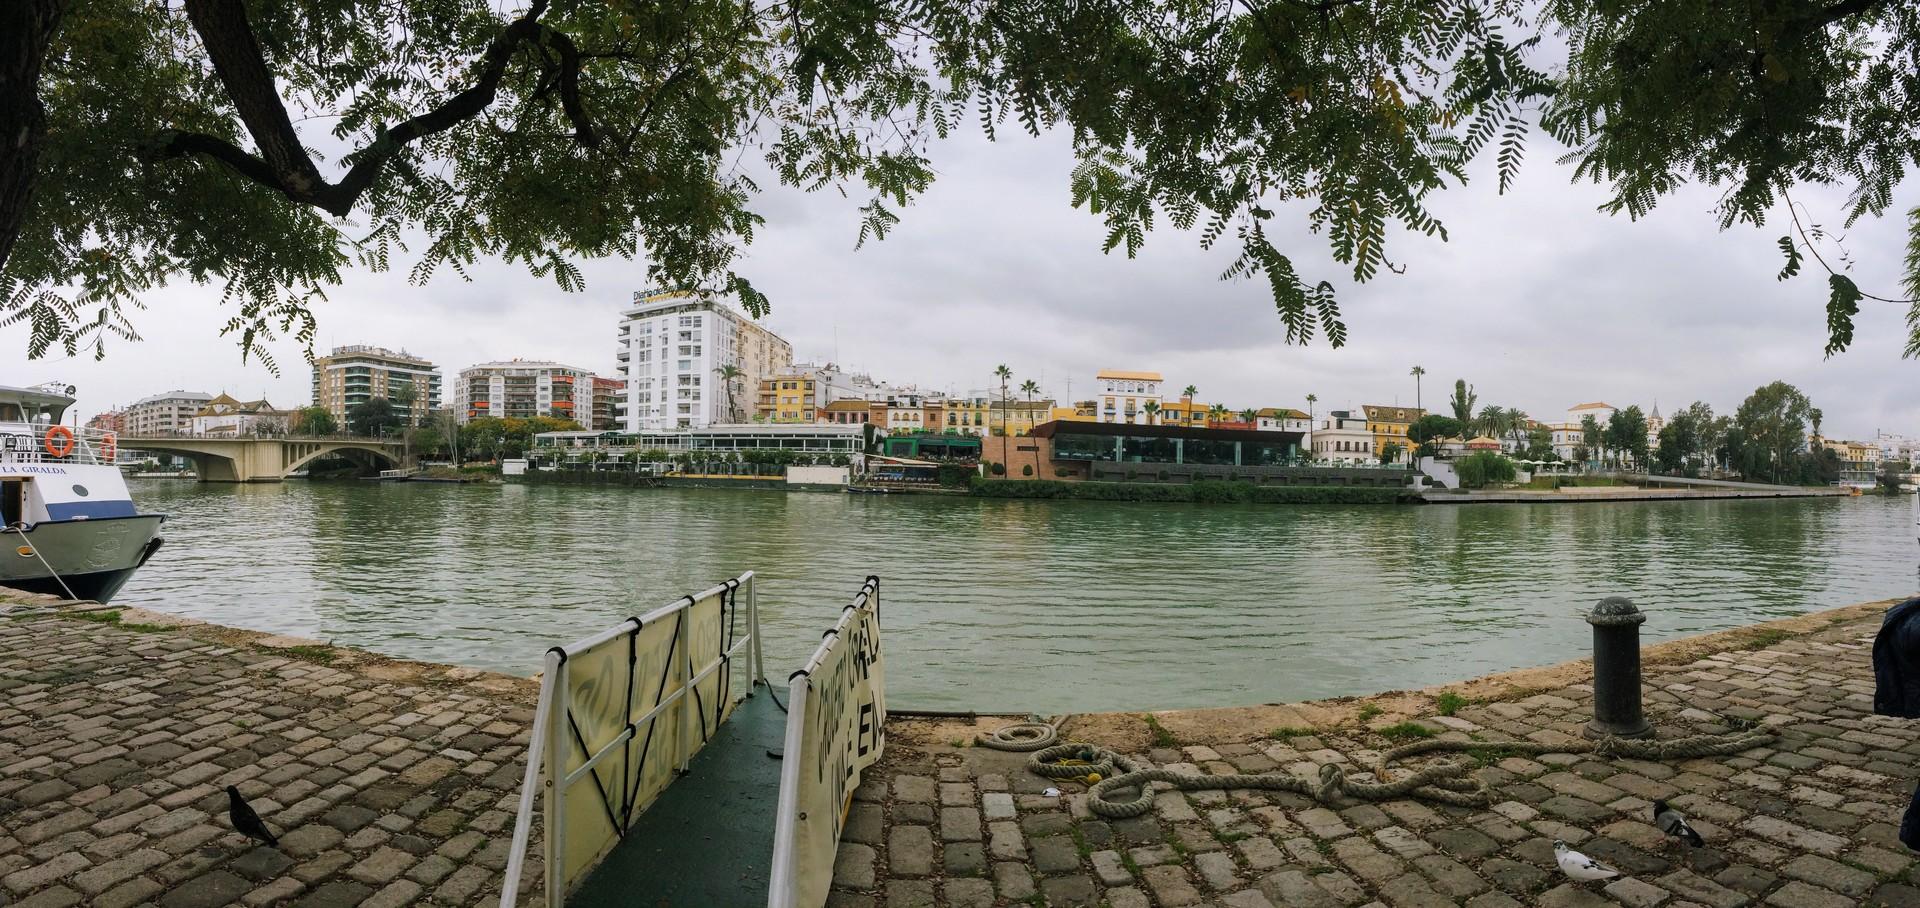 seville-winter-69a45a854b4abe0db15768087